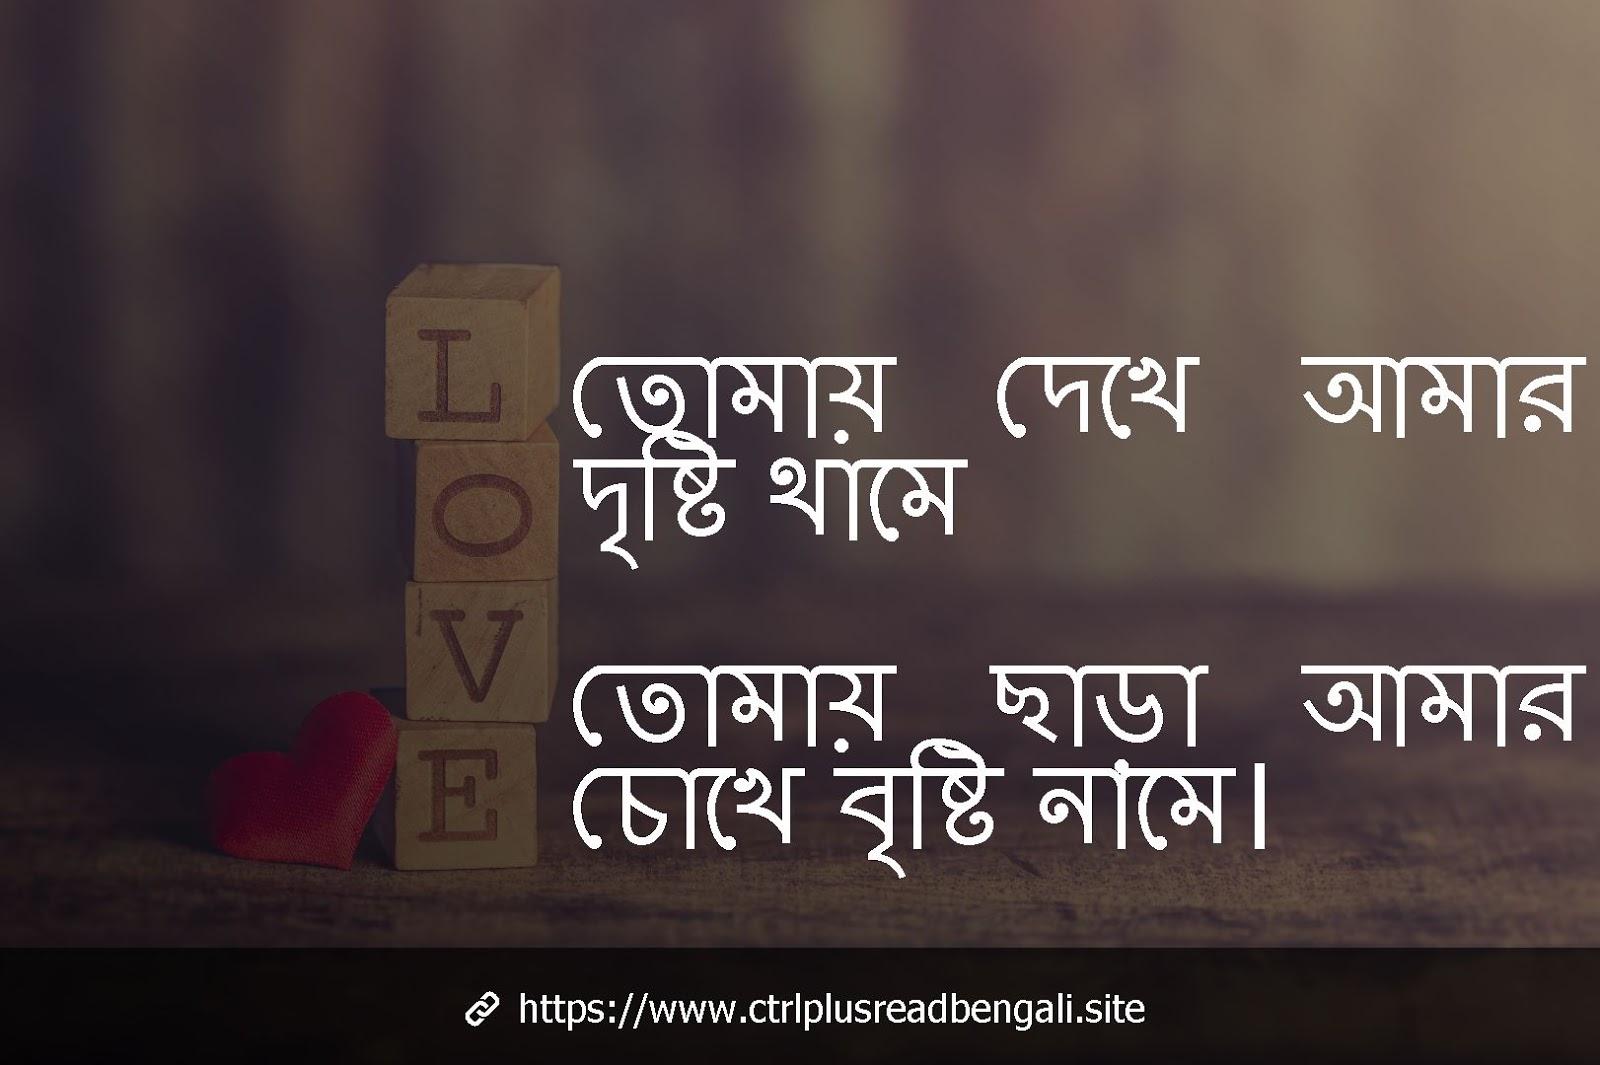 Benagli Emotional Quotes